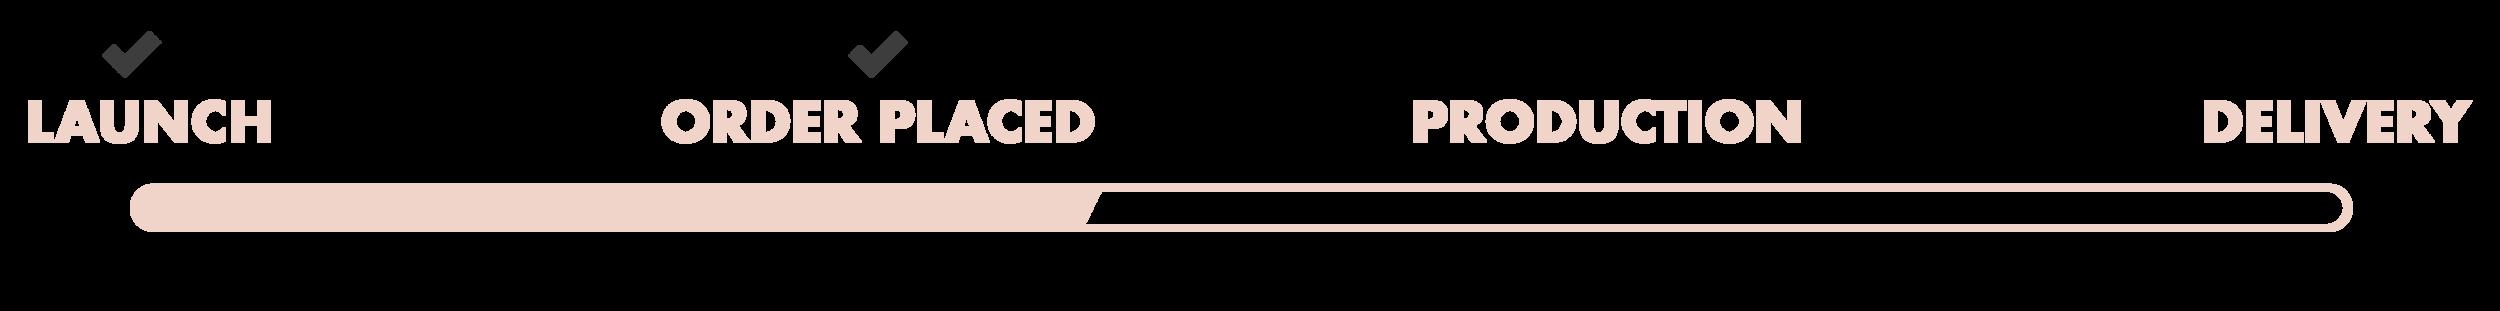 Production-Bar-2.png